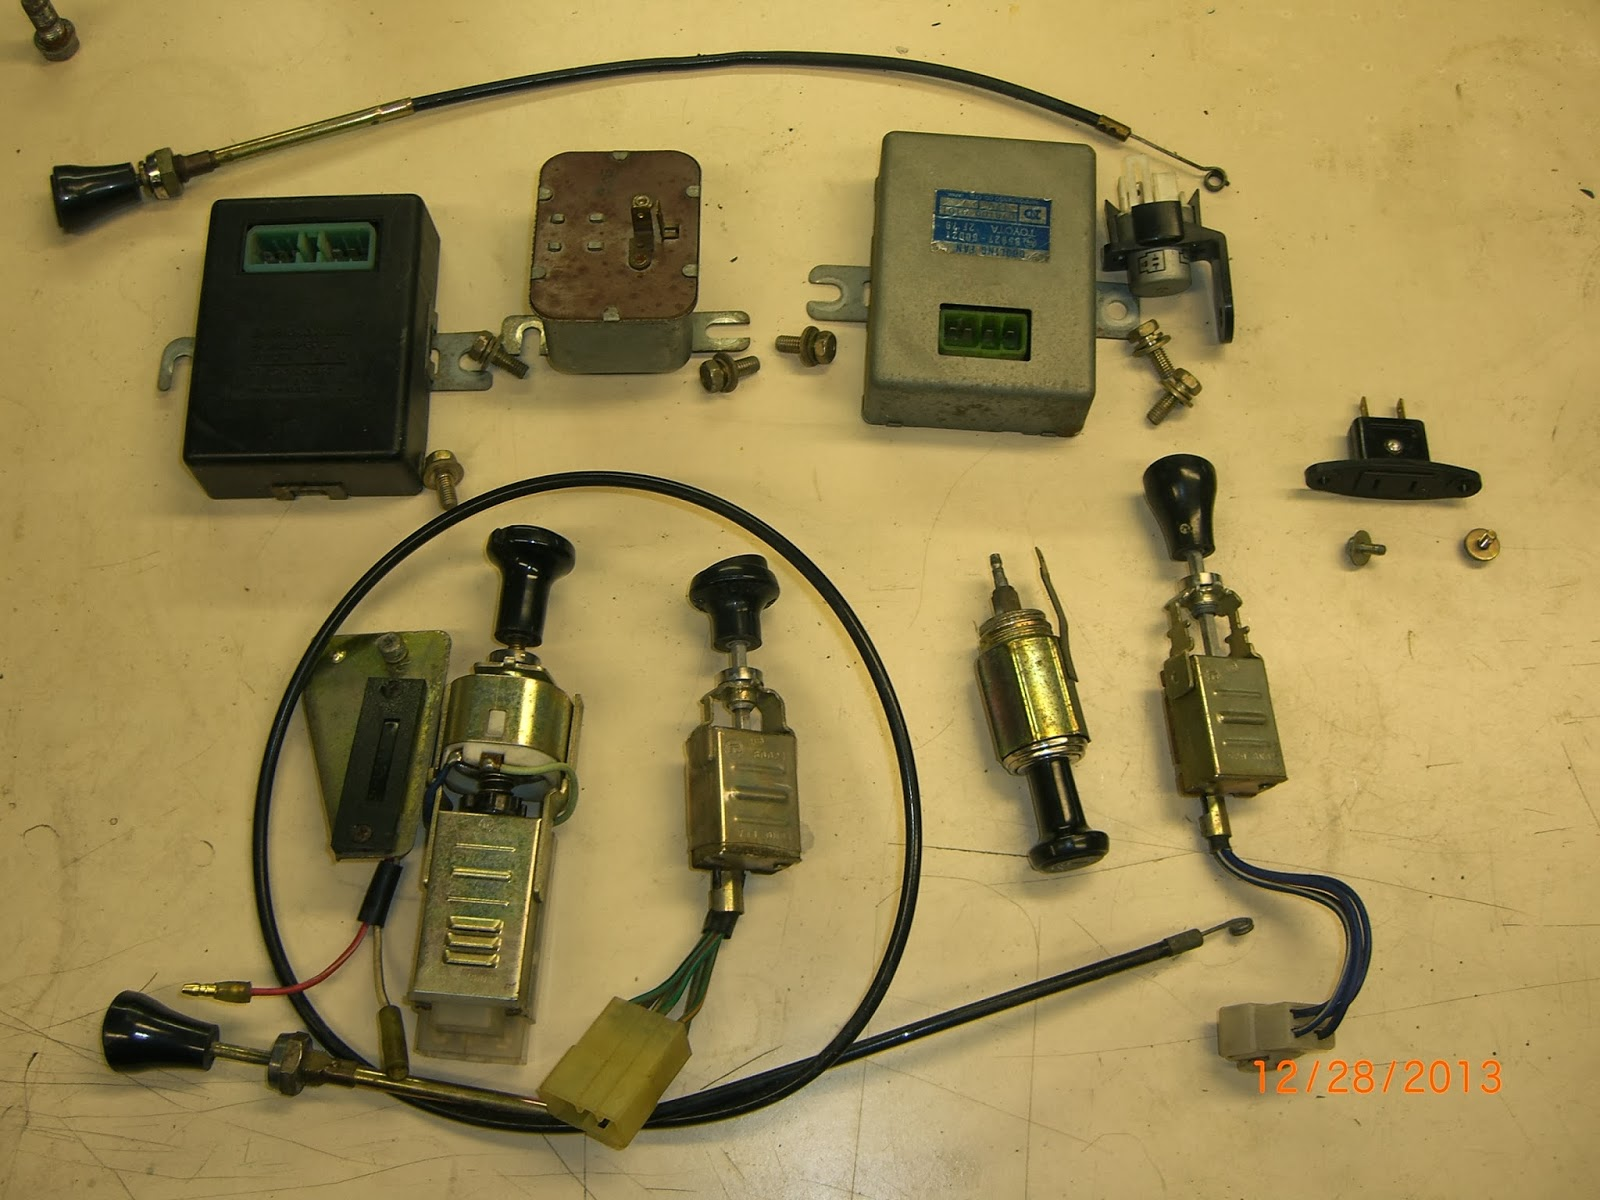 painless wire harness toyota fj40 vintage mopar wiring toyota engine wiring harness fj40 wiring harness kit [ 1600 x 1200 Pixel ]